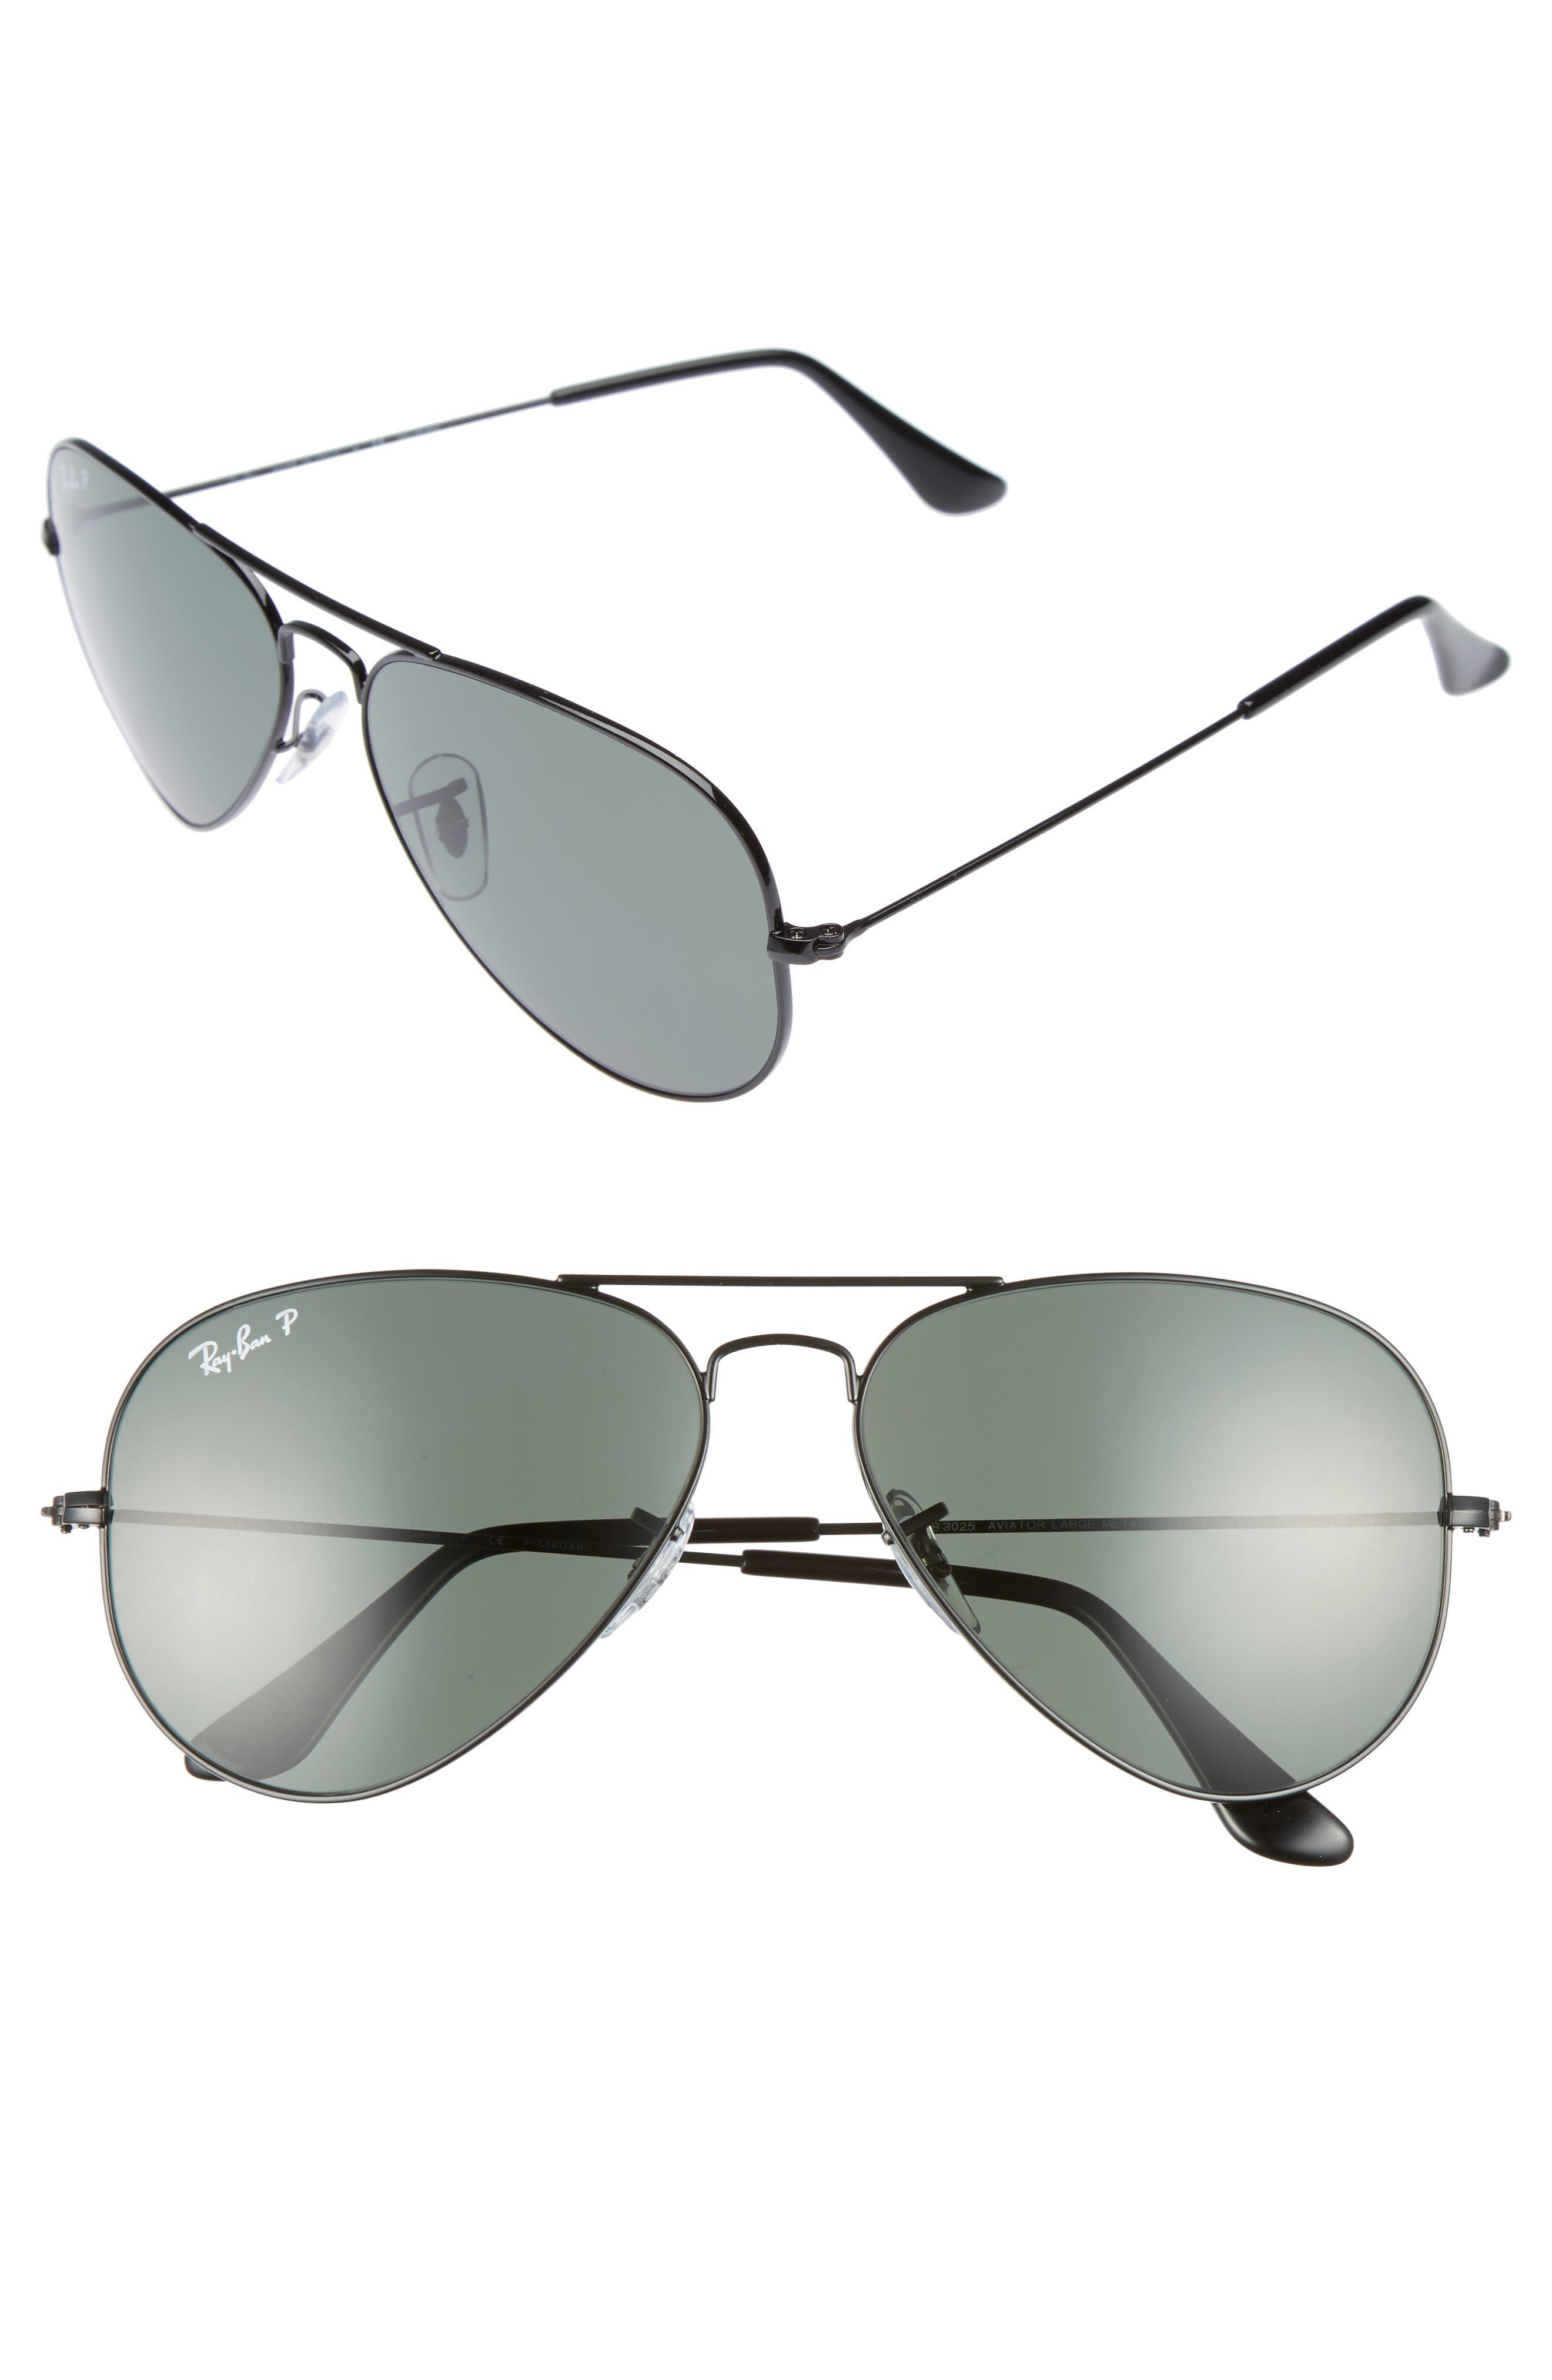 Ray-Ban Original 58mm Polarized Aviator Sunglasses